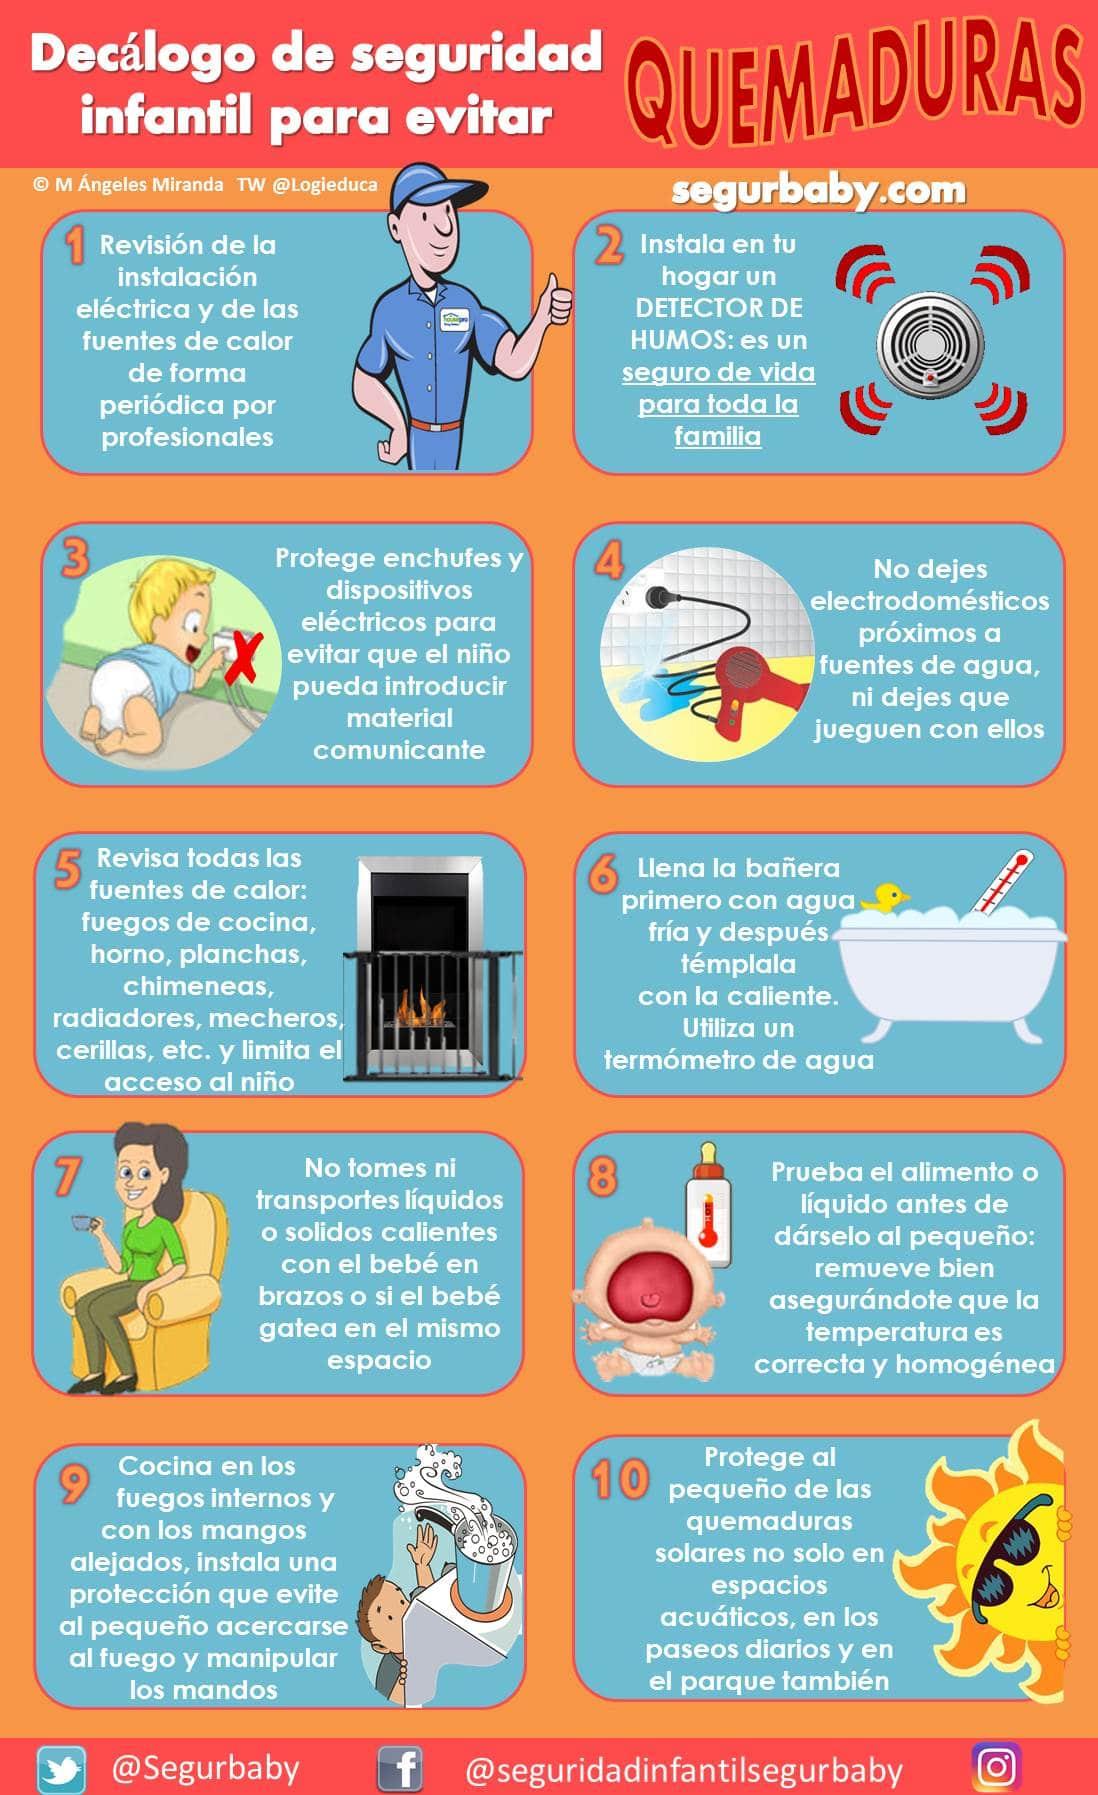 decálogo de seguridad infantil para evitar quemaduras